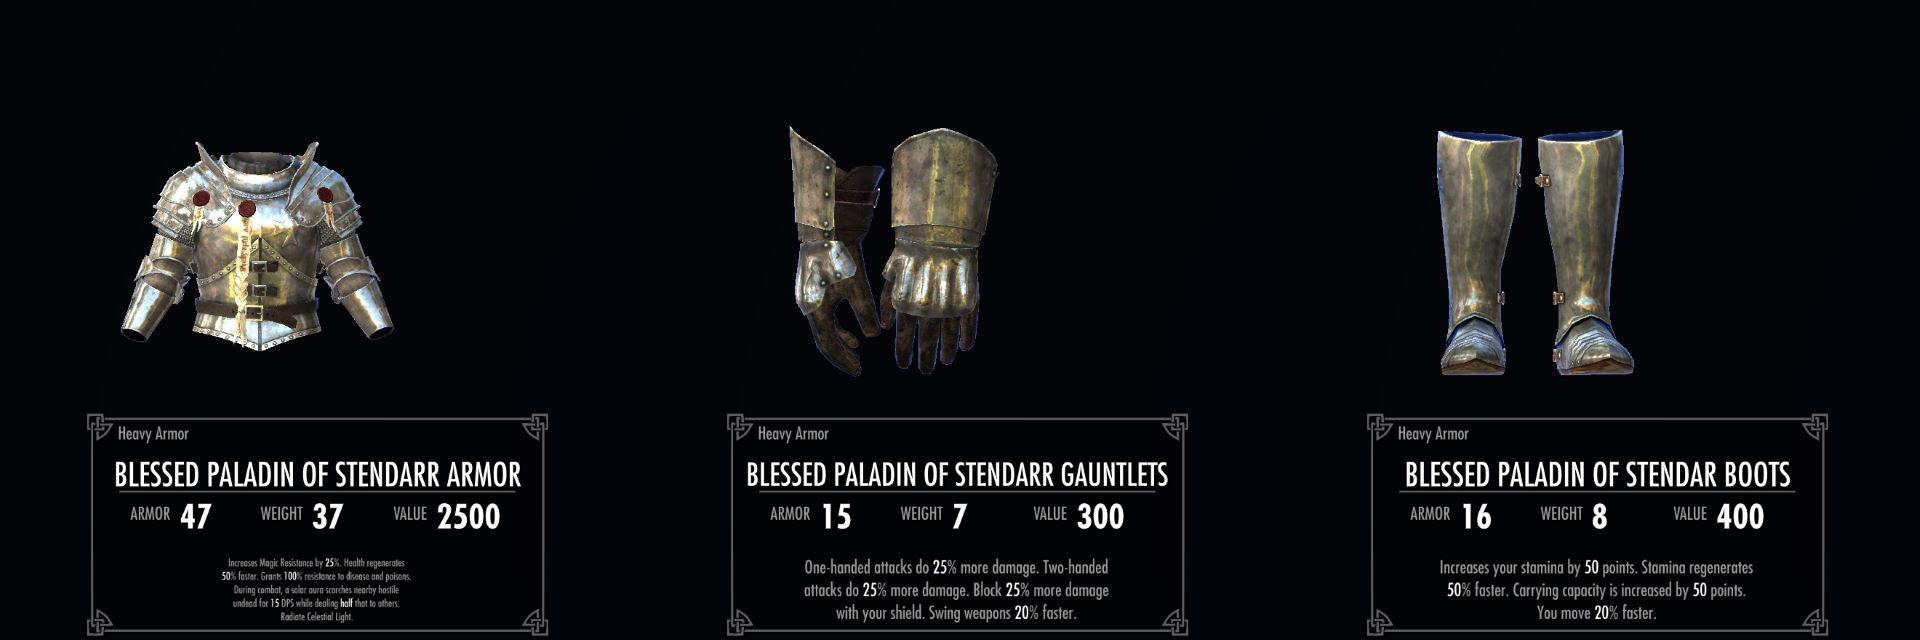 Skyrim SE: Mod紹介 - Stendarr Paladin Armor Set - 防具 紹介